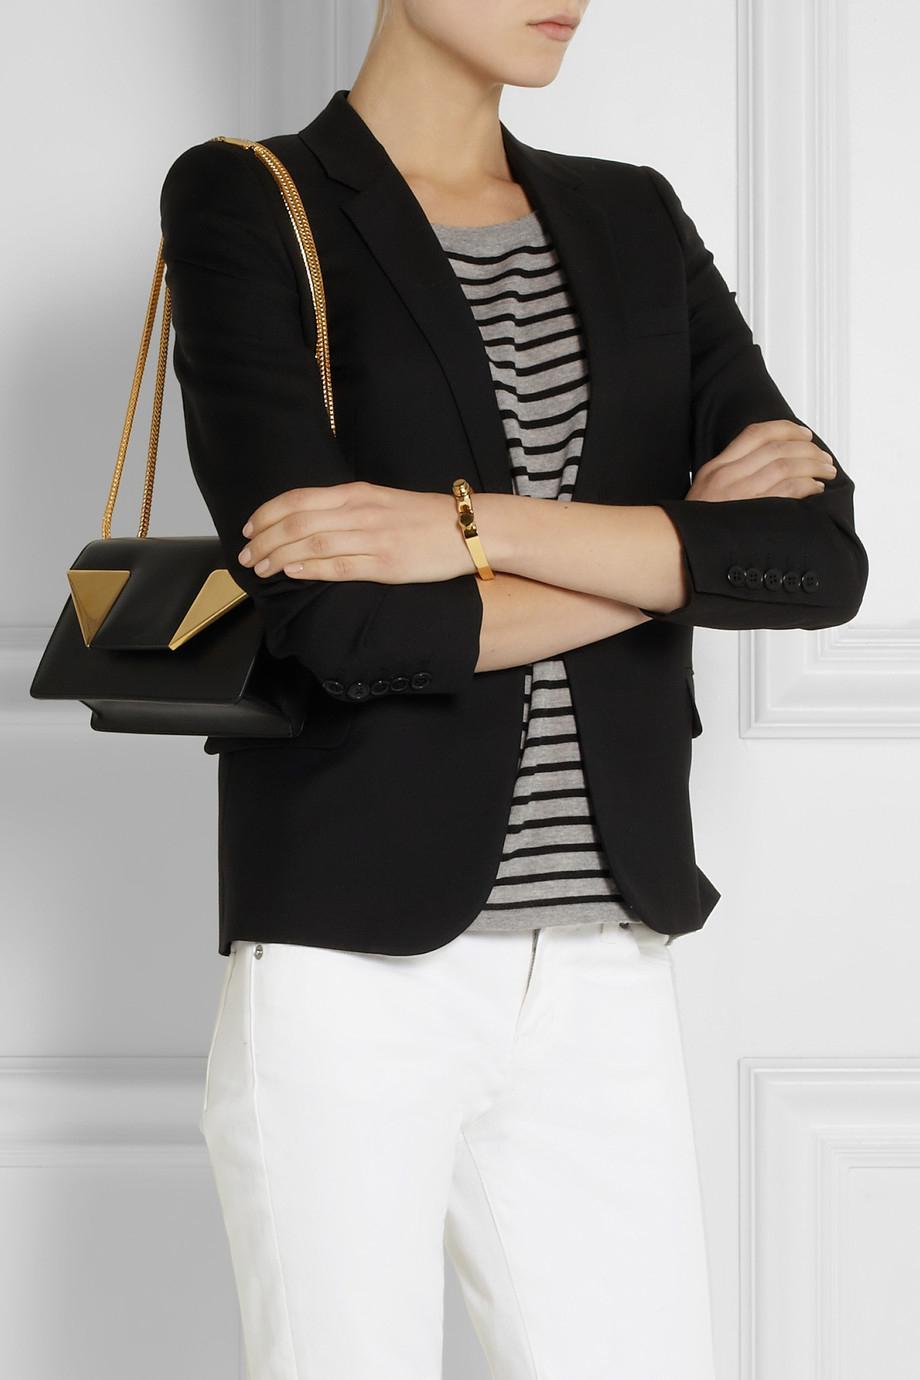 841276e941e Lyst - Saint Laurent Betty Small Leather Shoulder Bag in Black